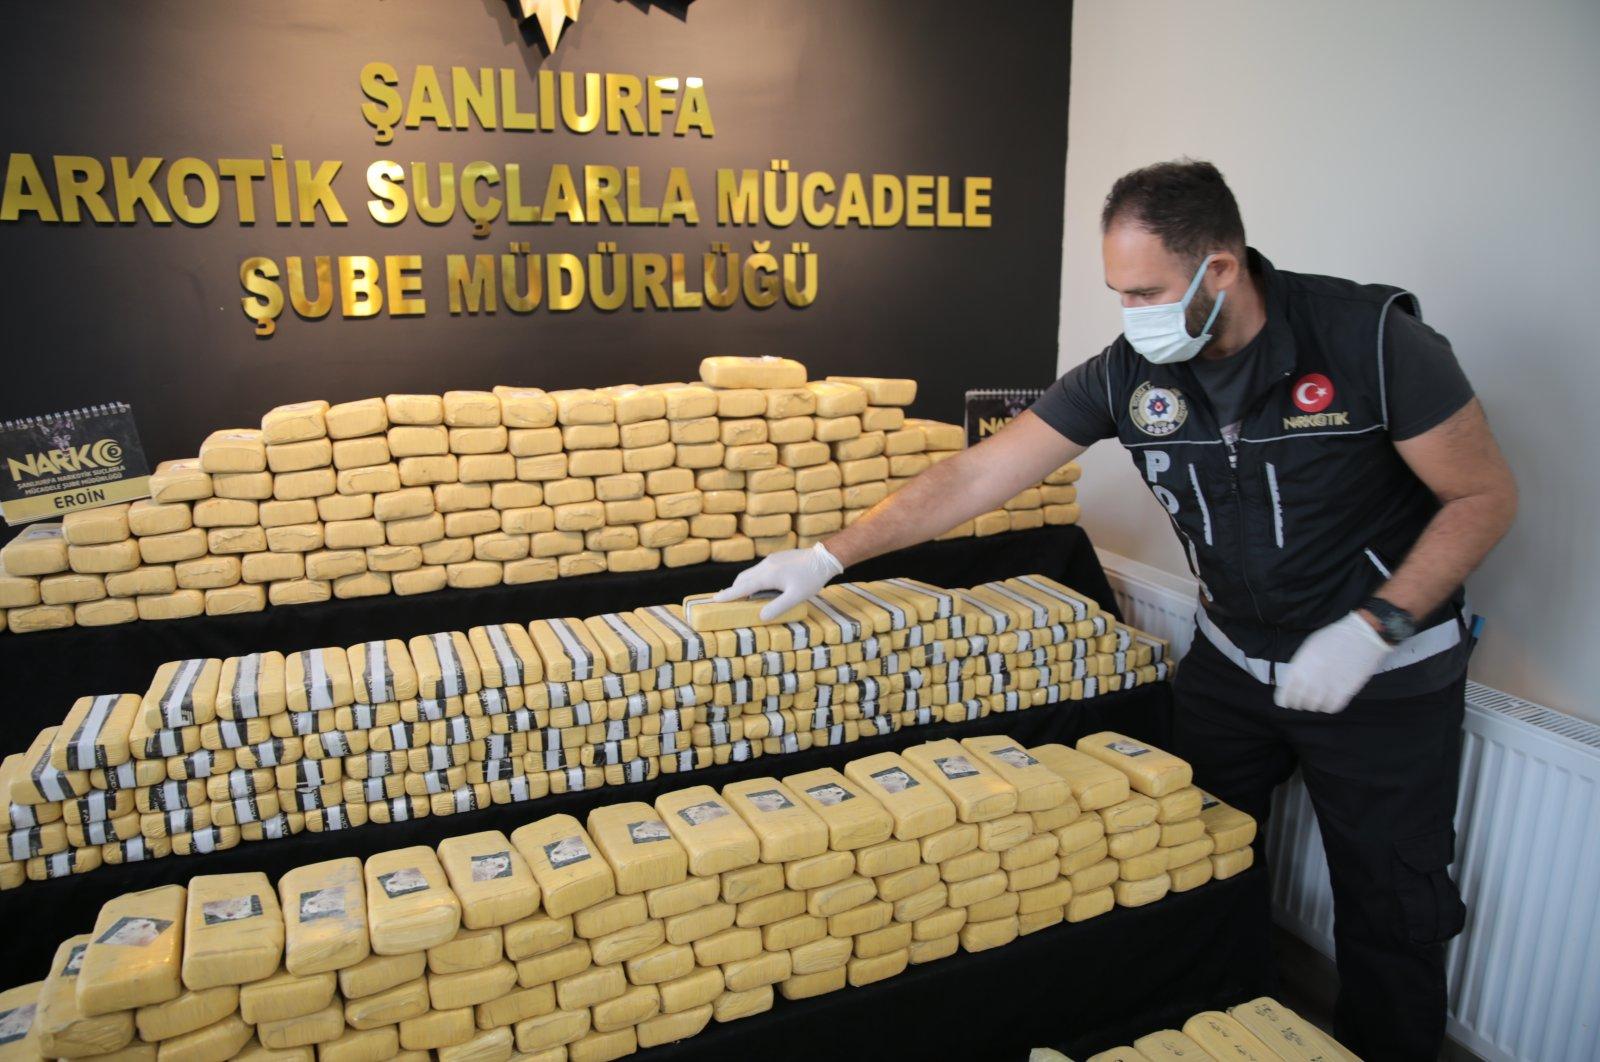 A police officer shows seized drugs to journalists, in Şanlıurfa, southeastern Turkey, Sept. 6, 2021. (AA PHOTO)